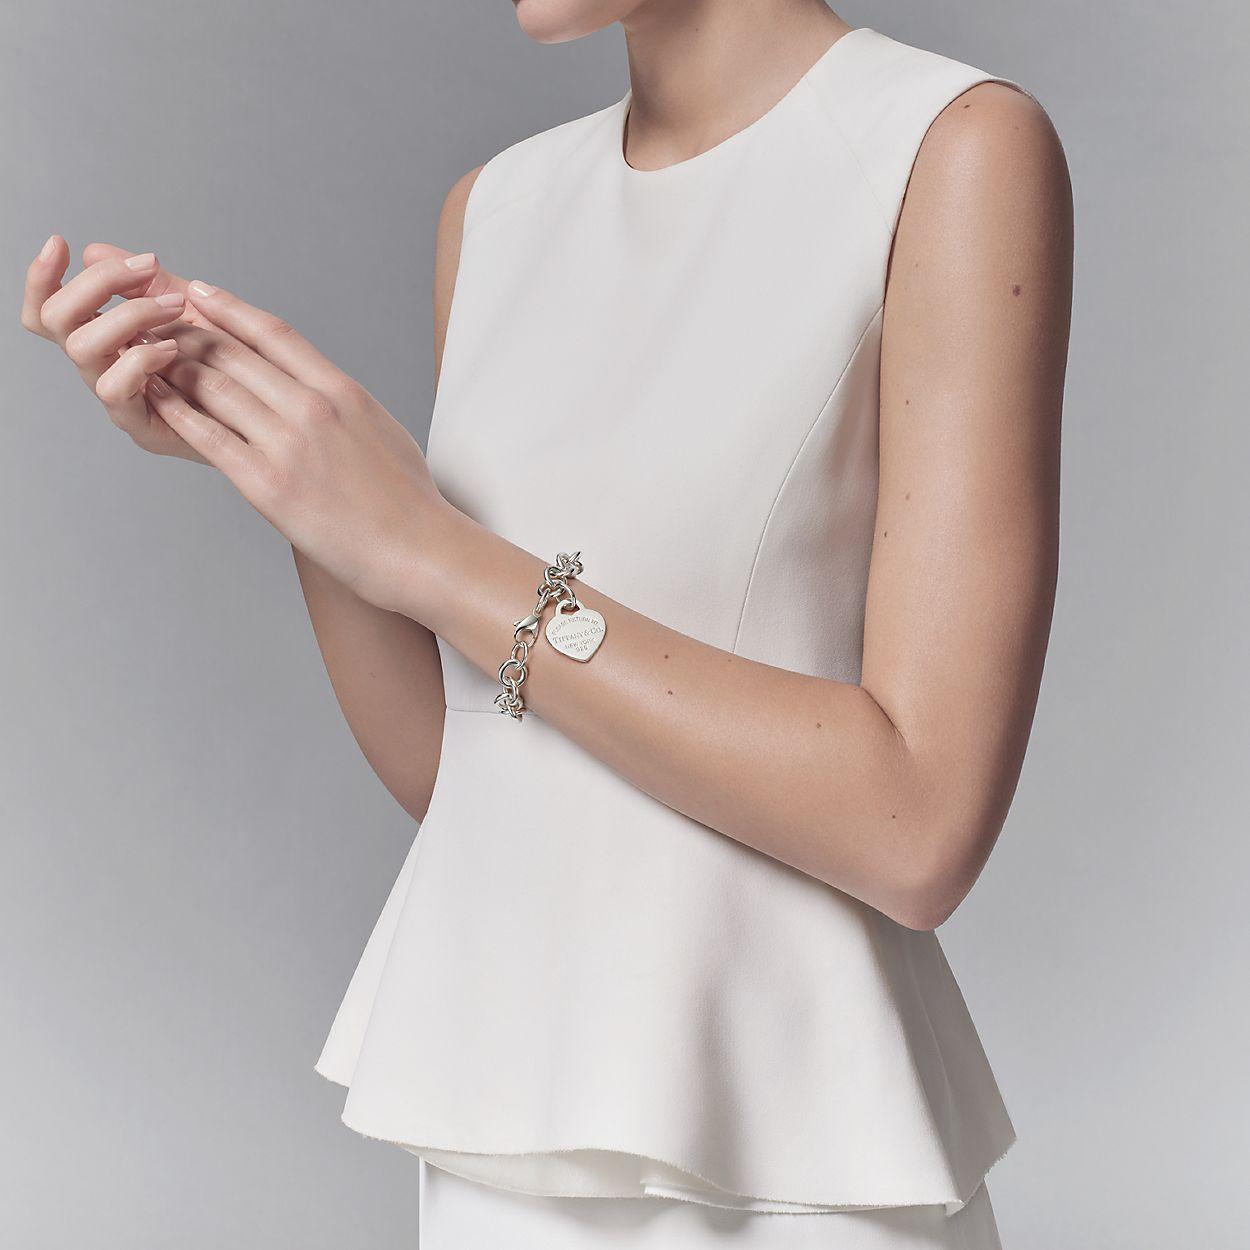 93238eaff Sterling Silver Heart Tag Charm Bracelet | Tiffany & Co.